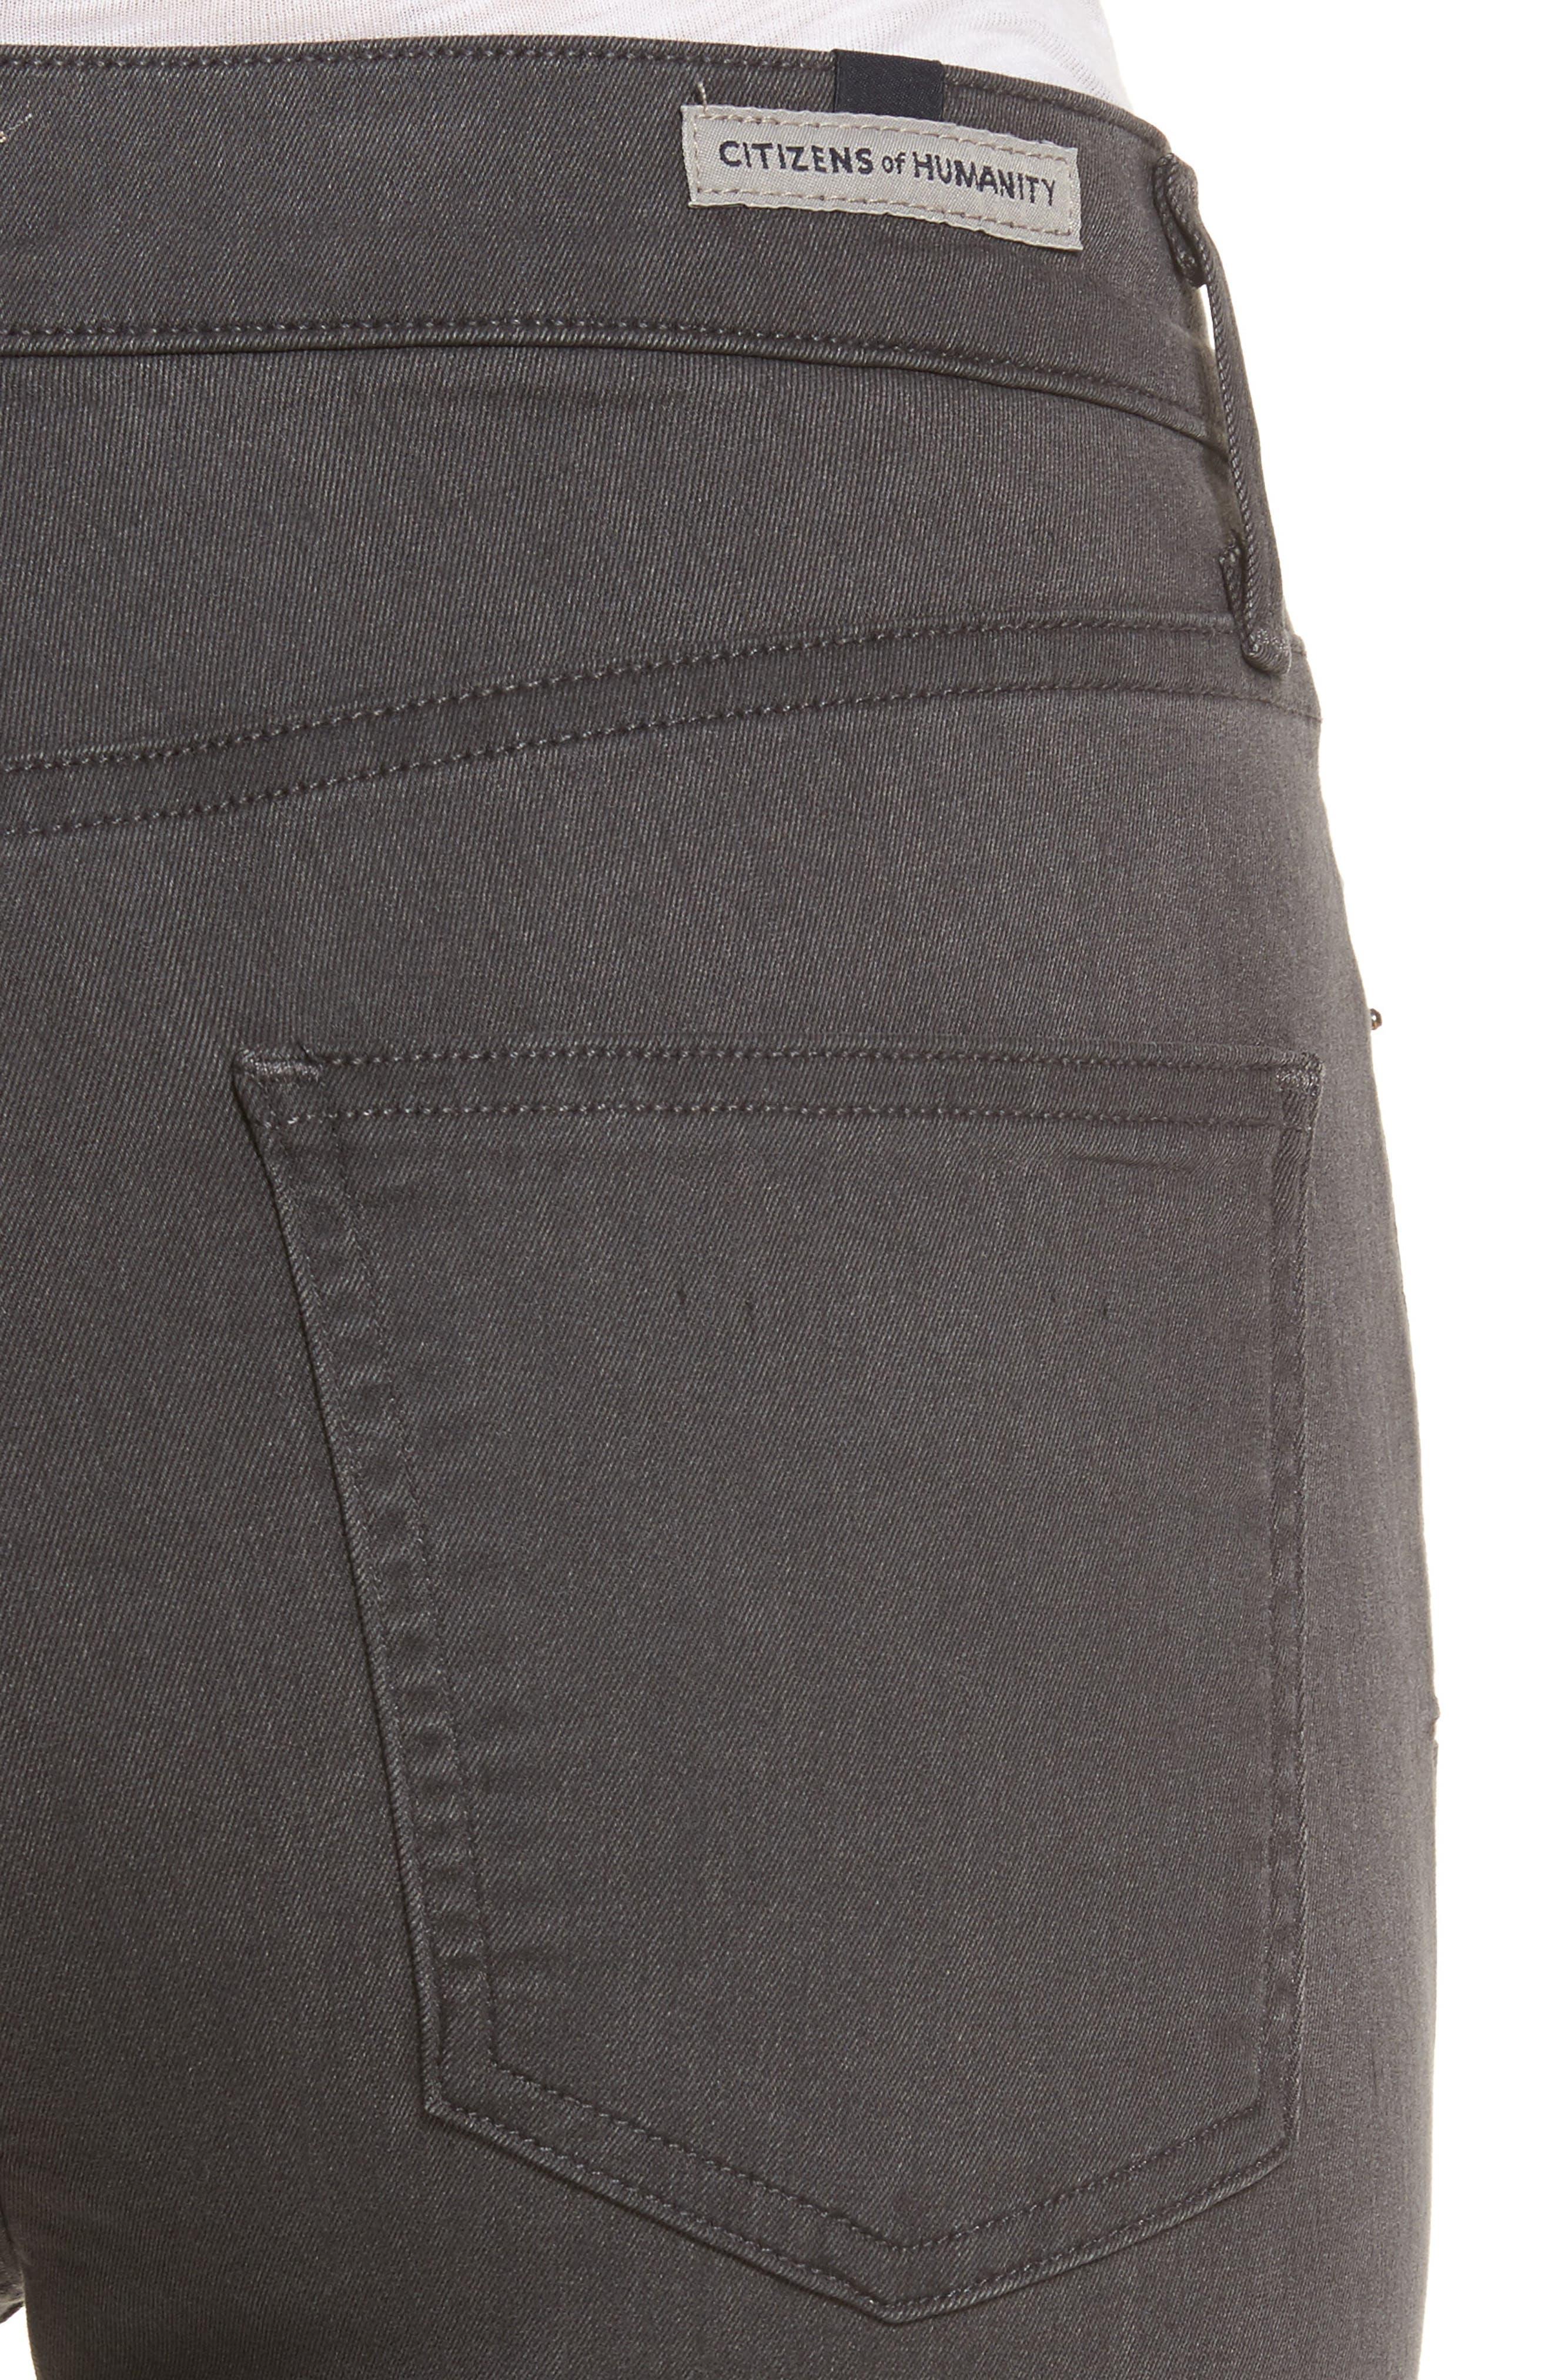 Rocket Petite High Waist Skinny Jeans,                             Alternate thumbnail 4, color,                             034